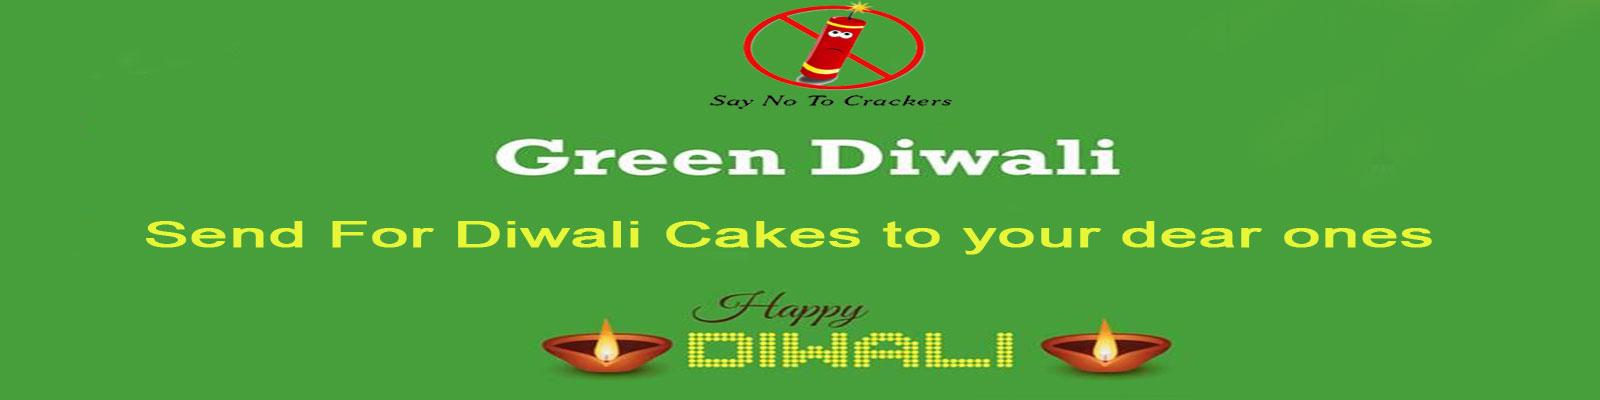 GreenDiwali 4